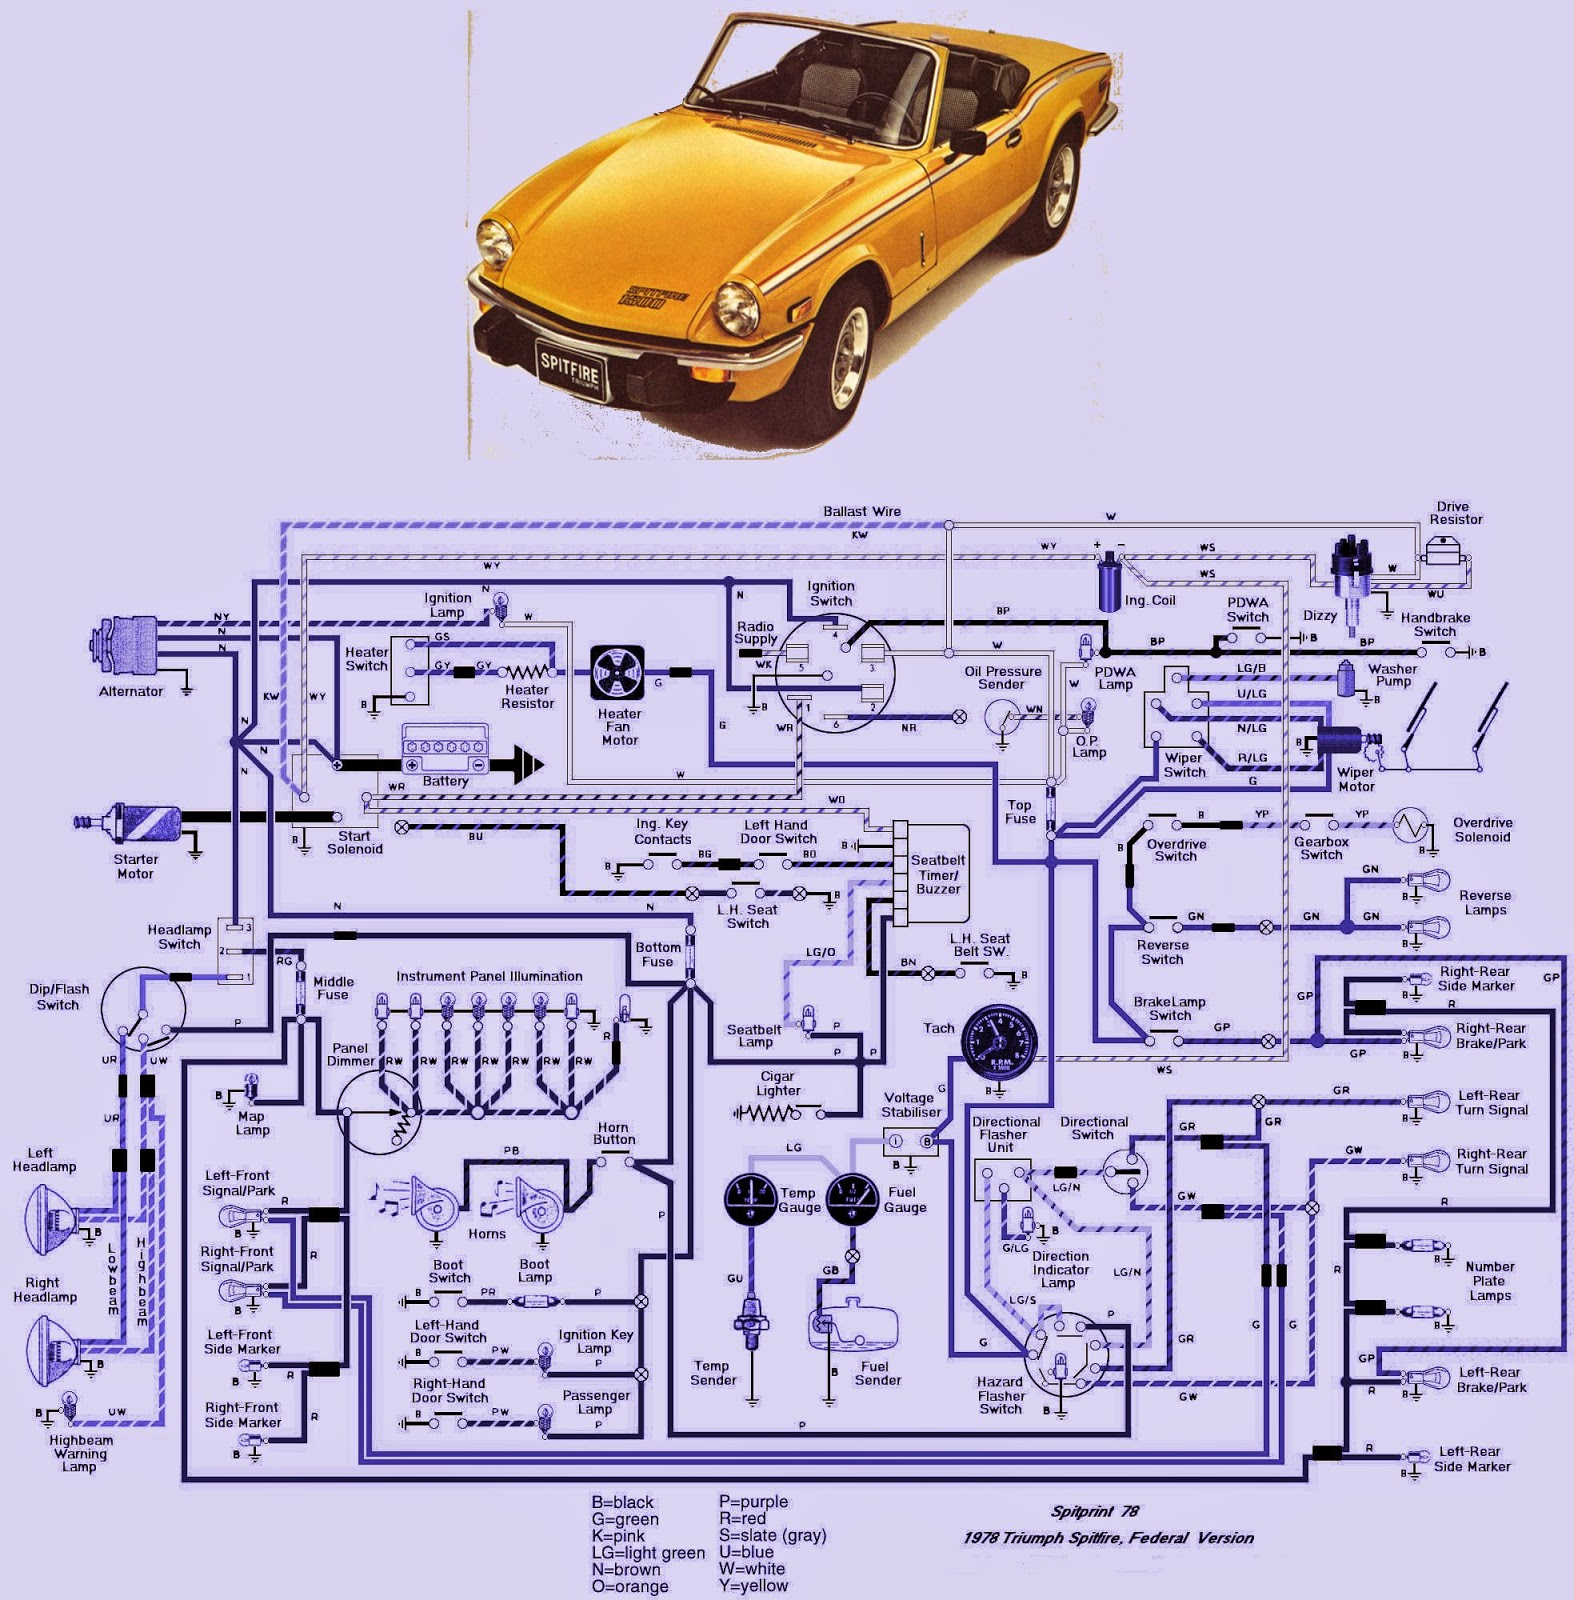 1978 Triumph Spitfire Wiring Diagram | Auto Wiring Diagrams on 1969 ford mustang wiring diagram, 1975 triumph spitfire wiring diagram, 1978 triumph spitfire exhaust, 1965 ford mustang wiring diagram, 2002 crown victoria wiring diagram, 1978 triumph spitfire parts, 1968 chevrolet camaro wiring diagram, 1978 triumph spitfire carburetor, 1978 triumph spitfire specifications, 1978 triumph spitfire radiator, 1978 triumph spitfire engine swap, 1968 triumph spitfire wiring diagram, 1978 triumph spitfire air cleaner, 1970 triumph spitfire wiring diagram, 1980 triumph spitfire wiring diagram, 1978 triumph spitfire seats, 1978 triumph spitfire rear suspension, 1978 triumph spitfire frame, 1955 ford thunderbird wiring diagram, 1973 triumph spitfire wiring diagram,